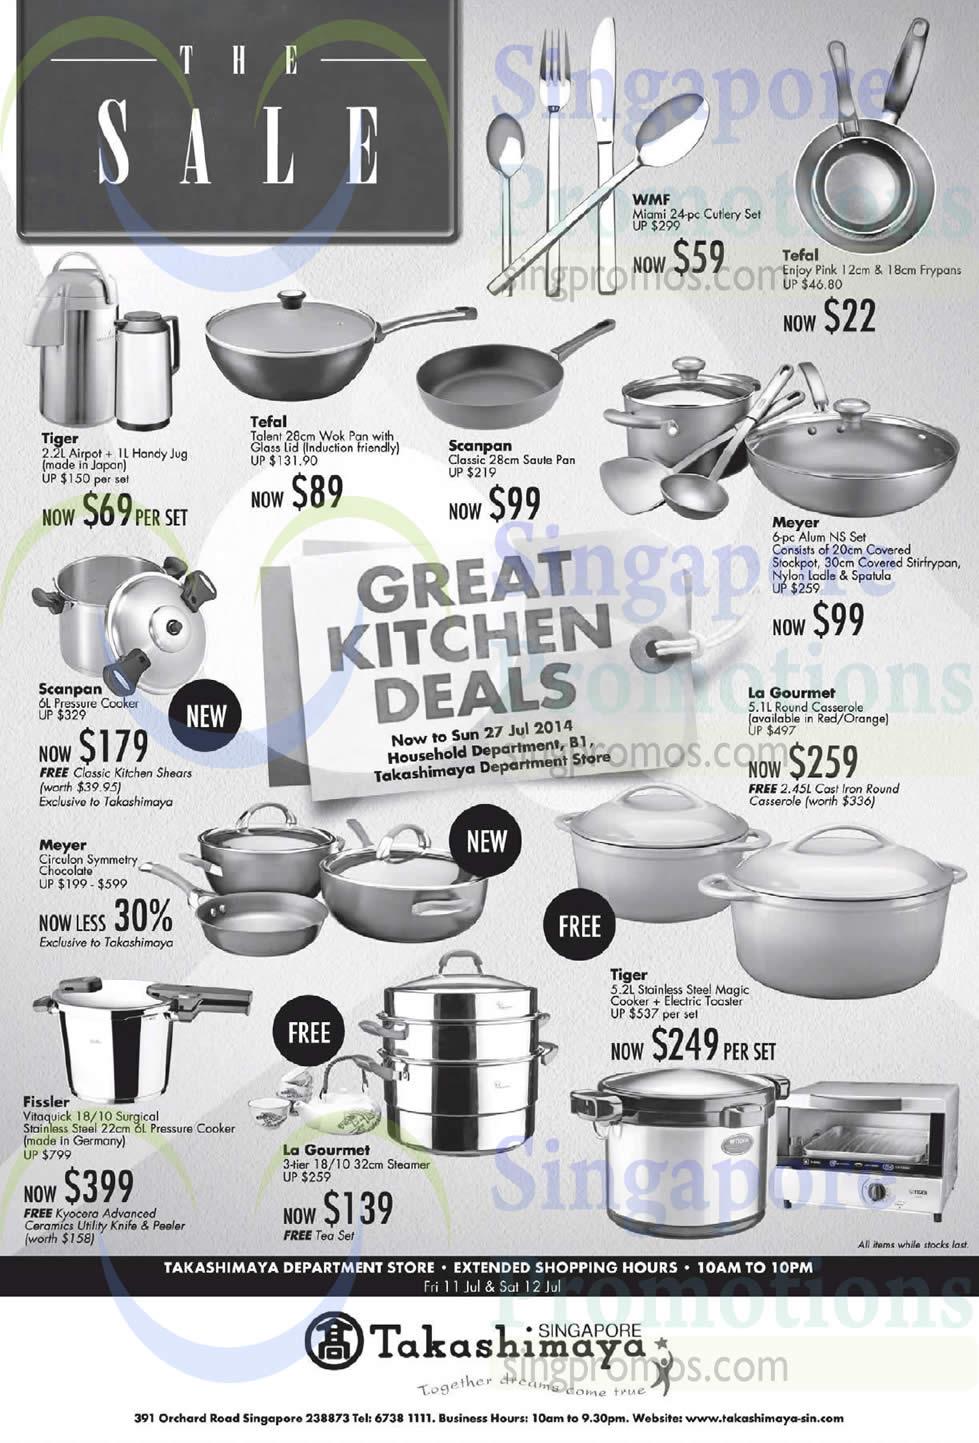 Takashimaya Great Kitchen Deals 11 – 27 Jul 2014